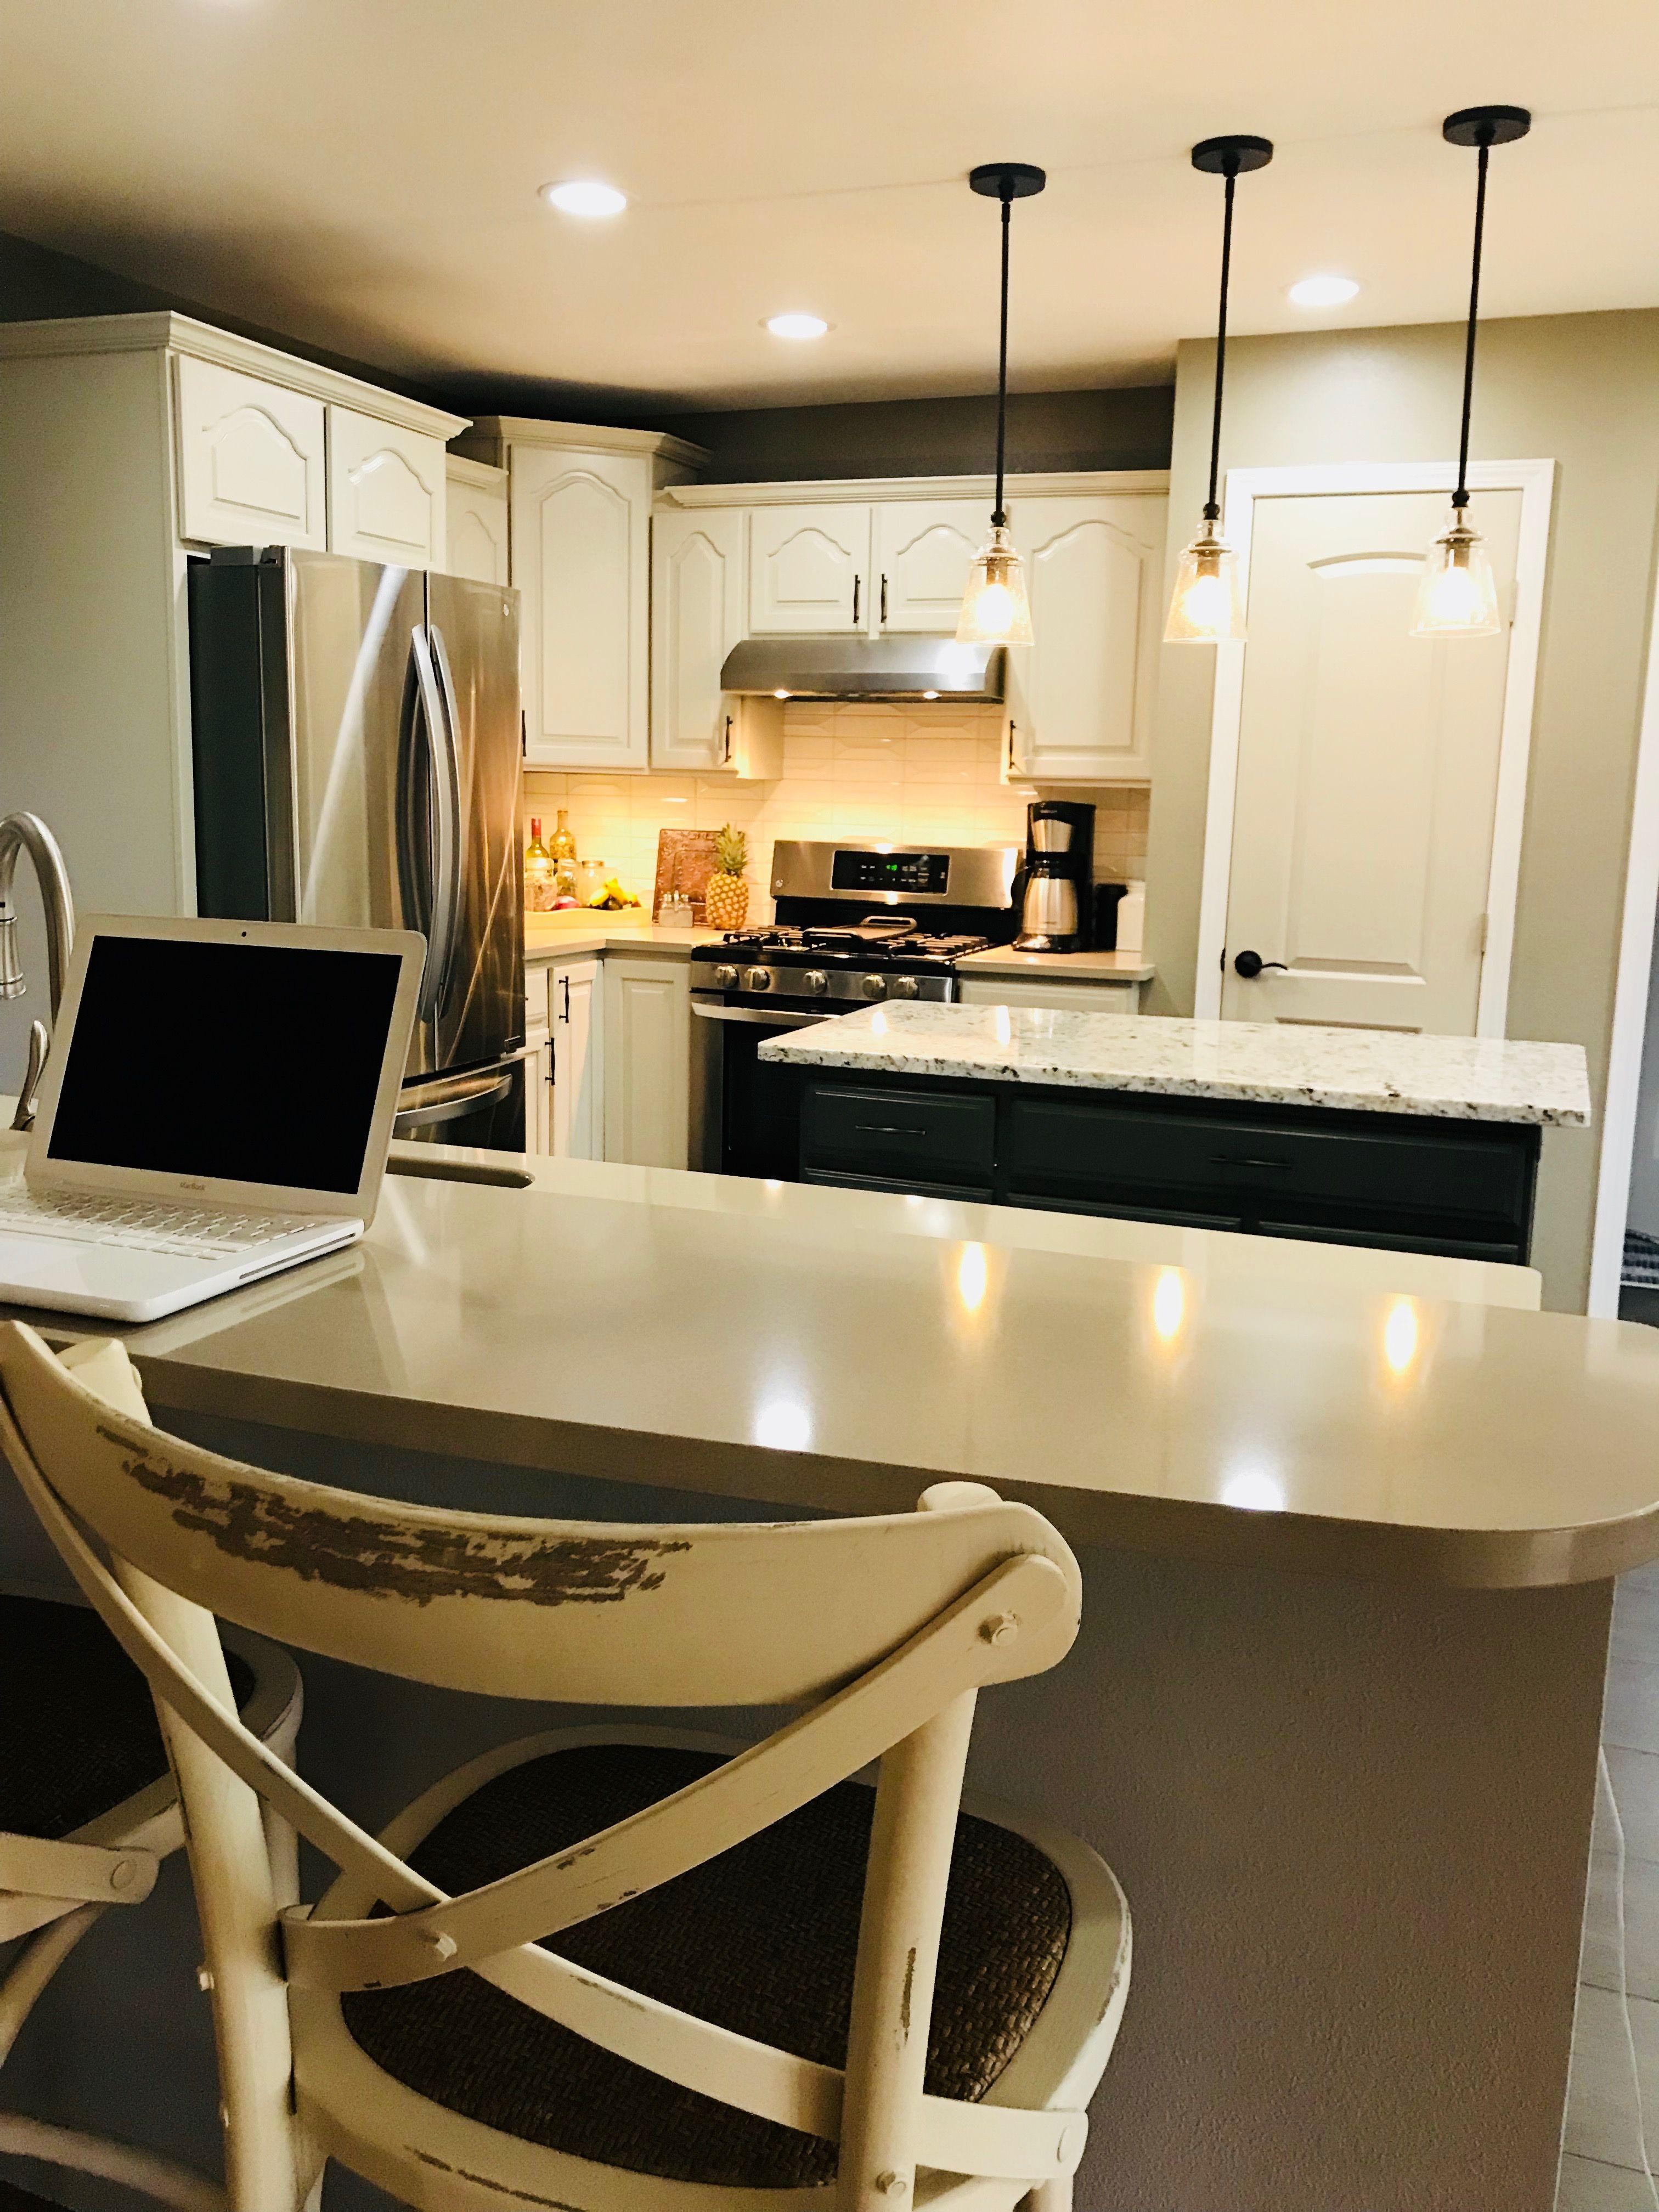 kitchen transformationrci interior design rose toth